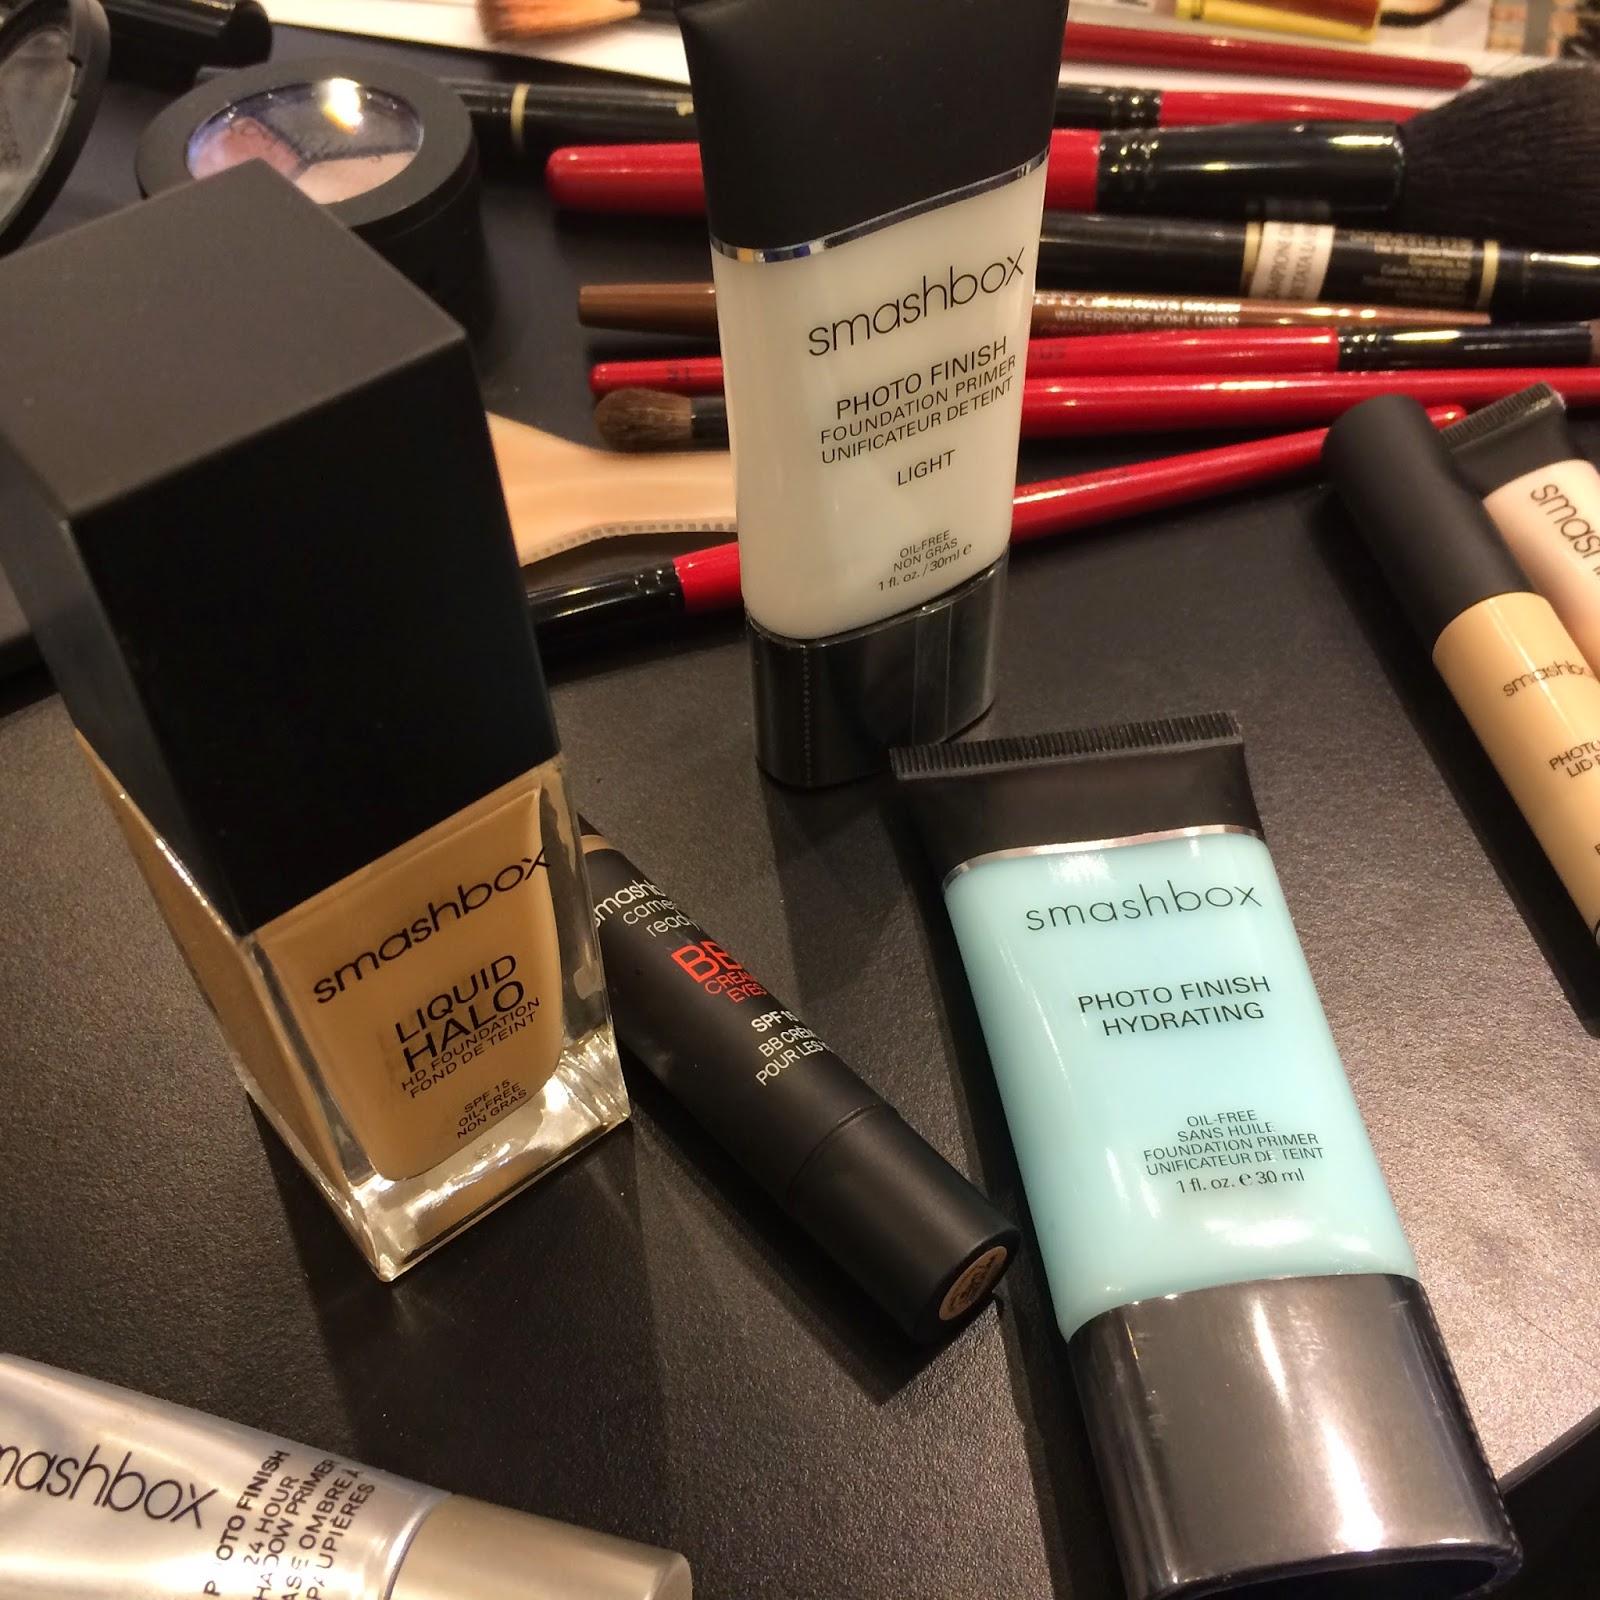 smashbox cosmetics makeup tour profumeria La gardenia